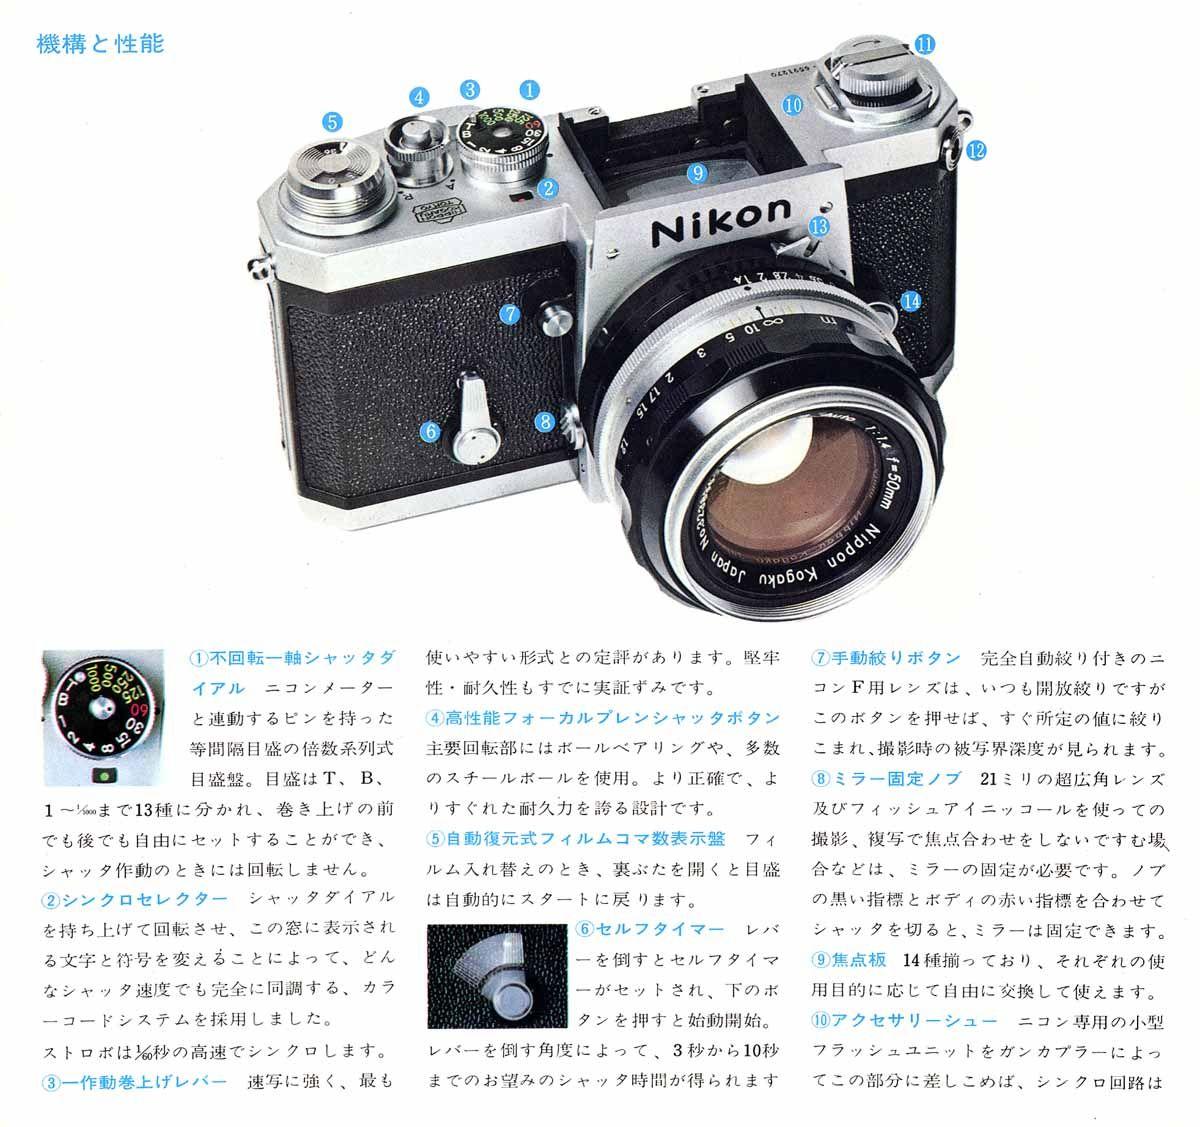 nikon-f | nikon | pinterest | カメラ、フィルムカメラ、大正